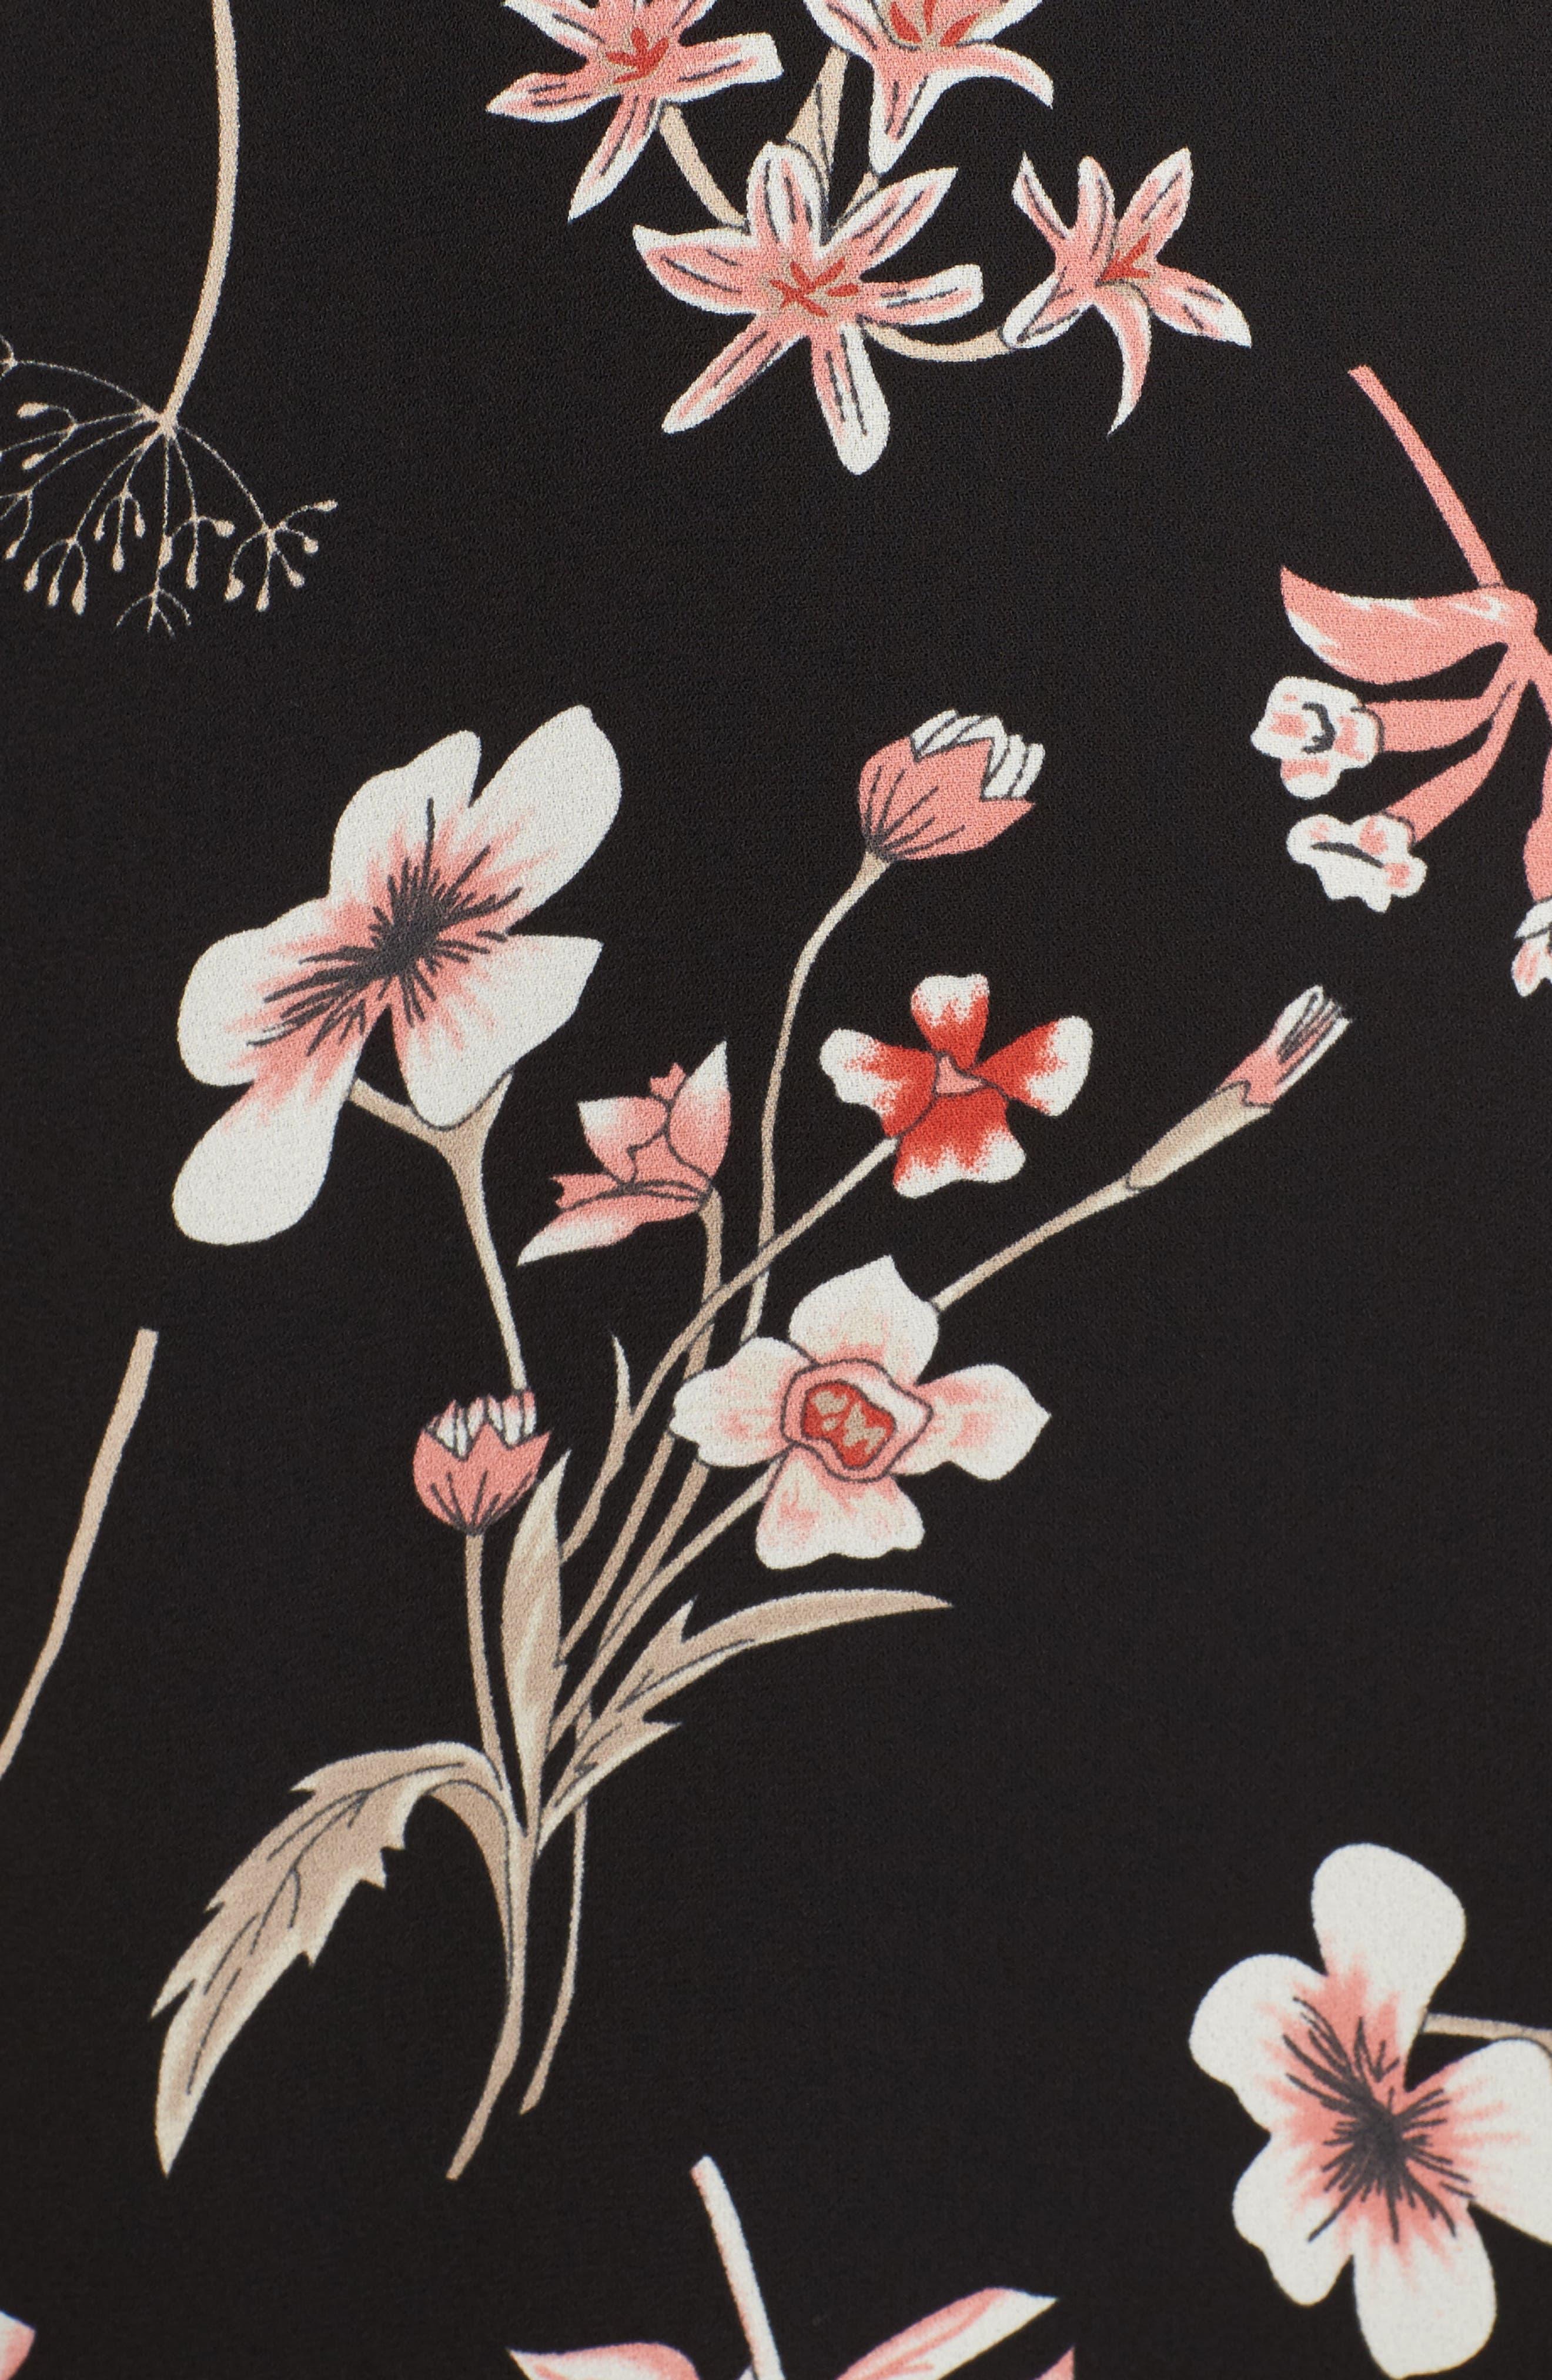 Floral Cold Shoulder Midi Dress,                             Alternate thumbnail 5, color,                             001